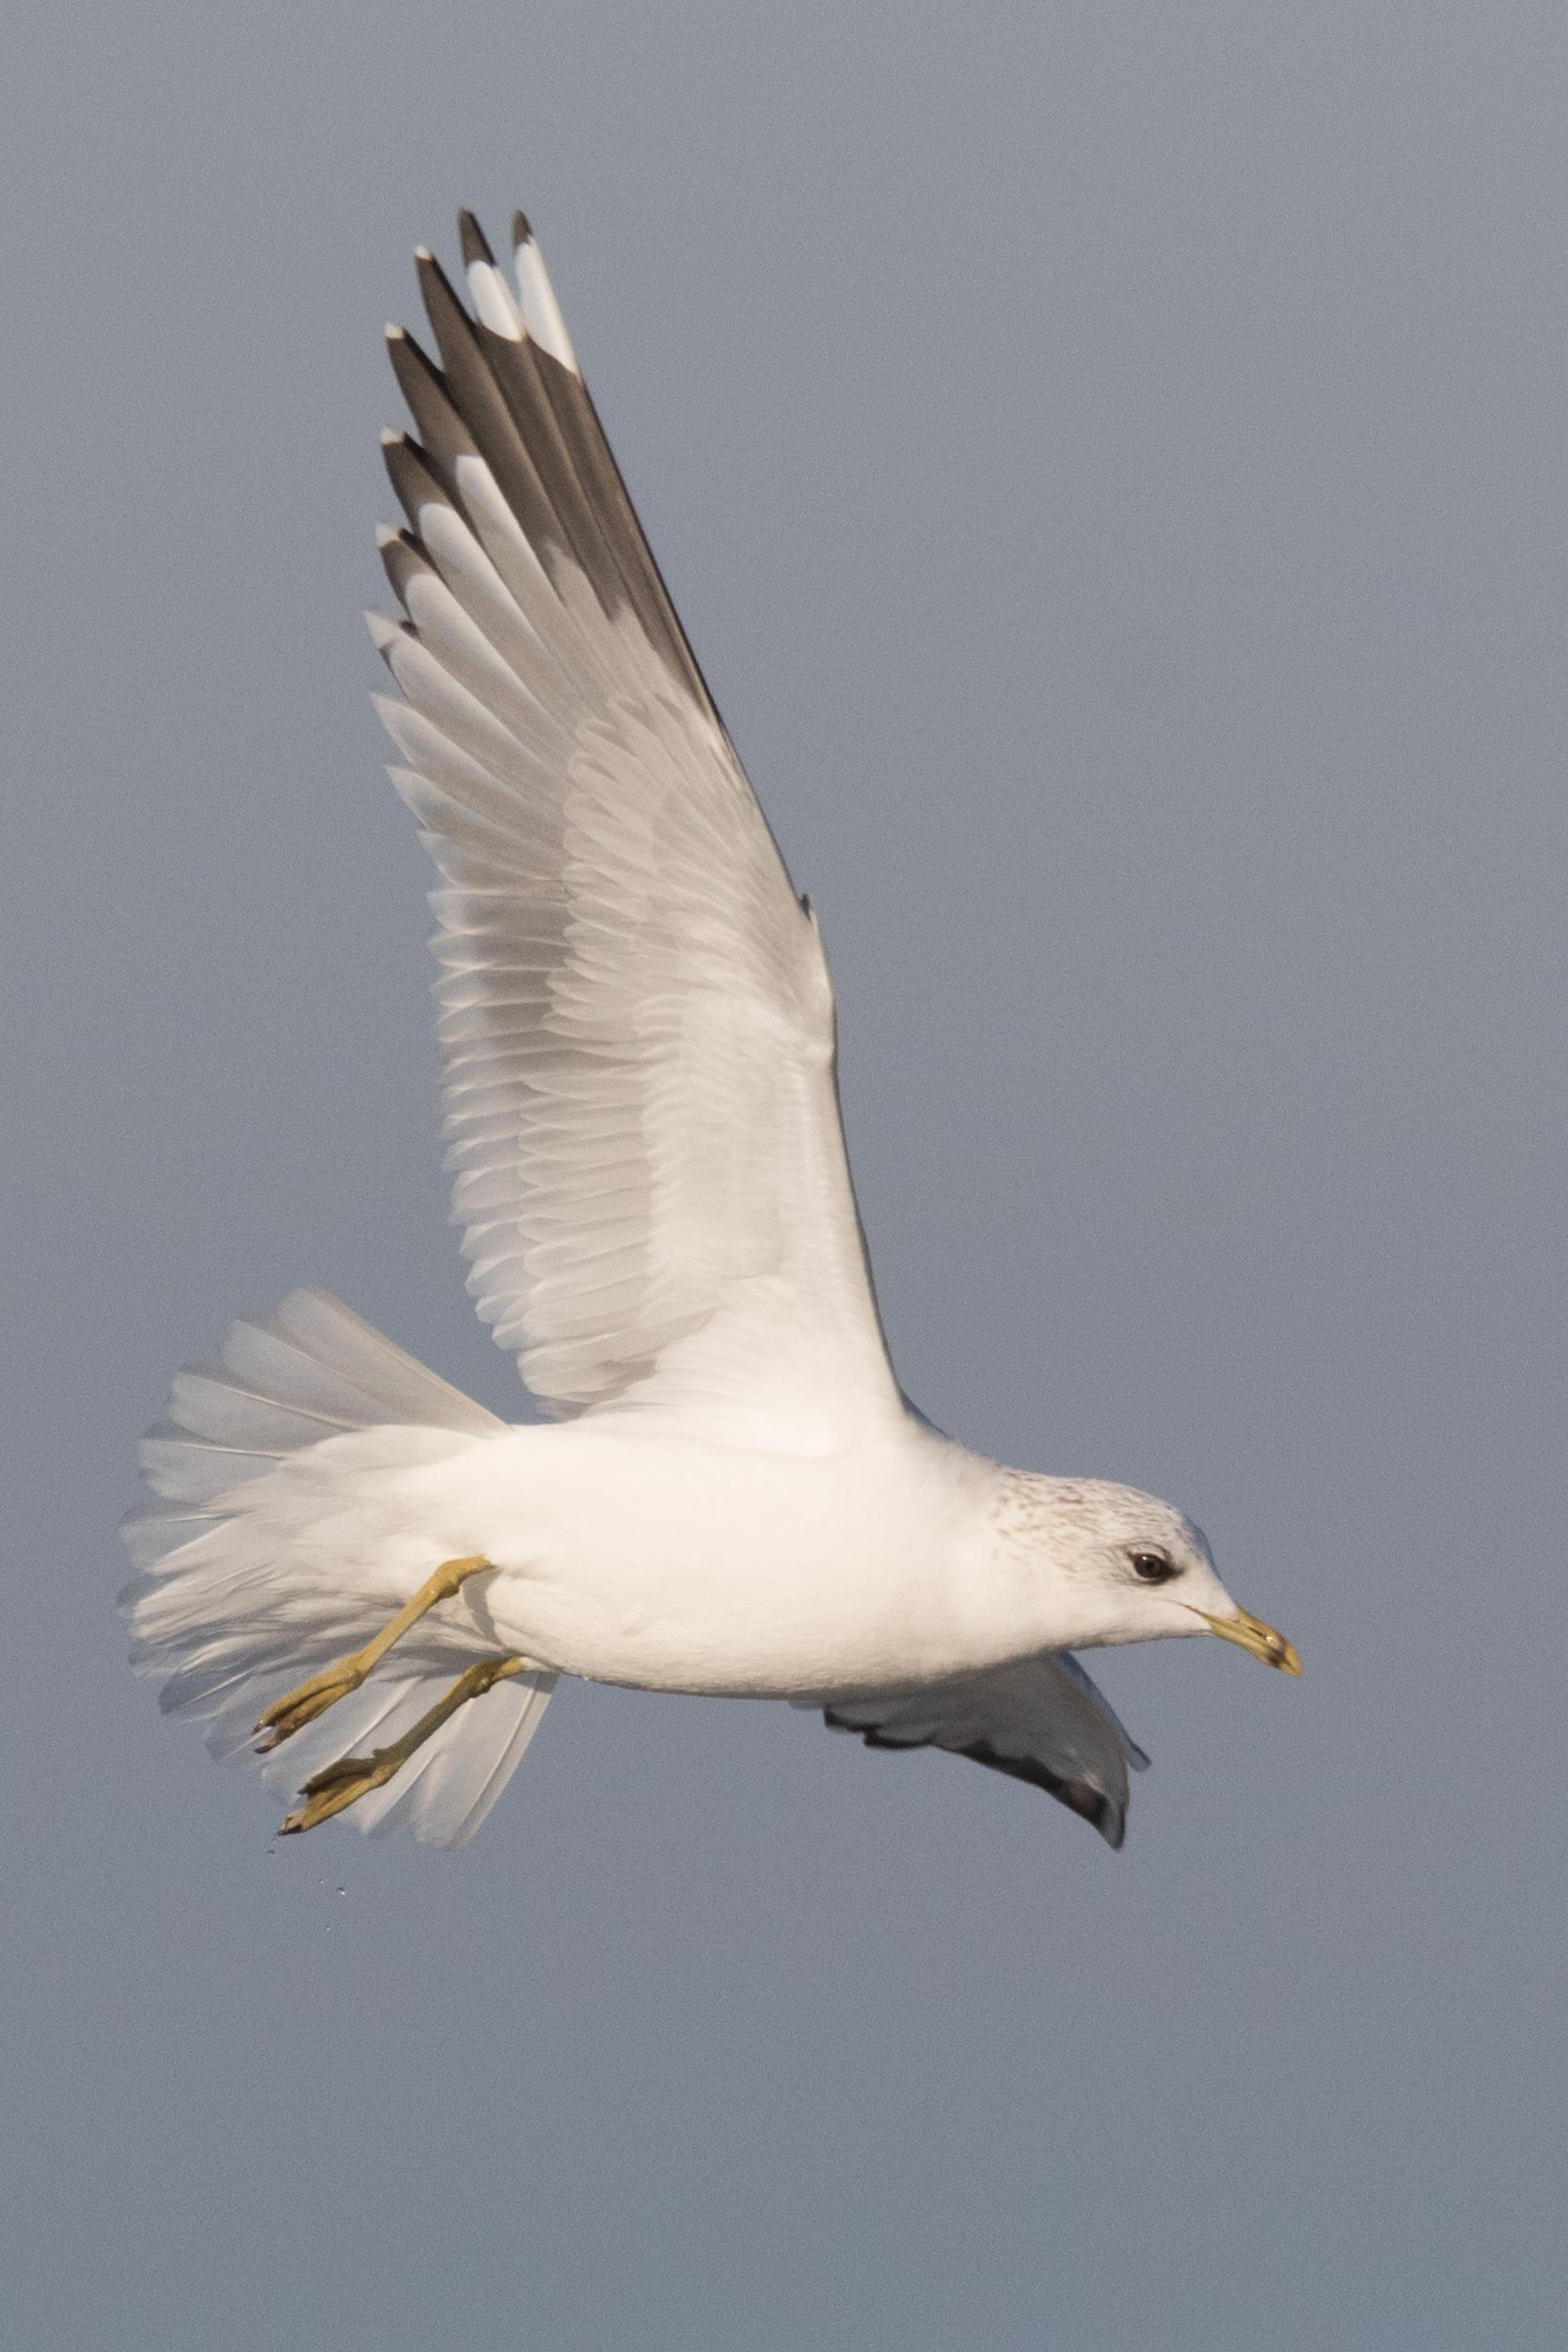 20170121-Common Gull Adult-164.jpg